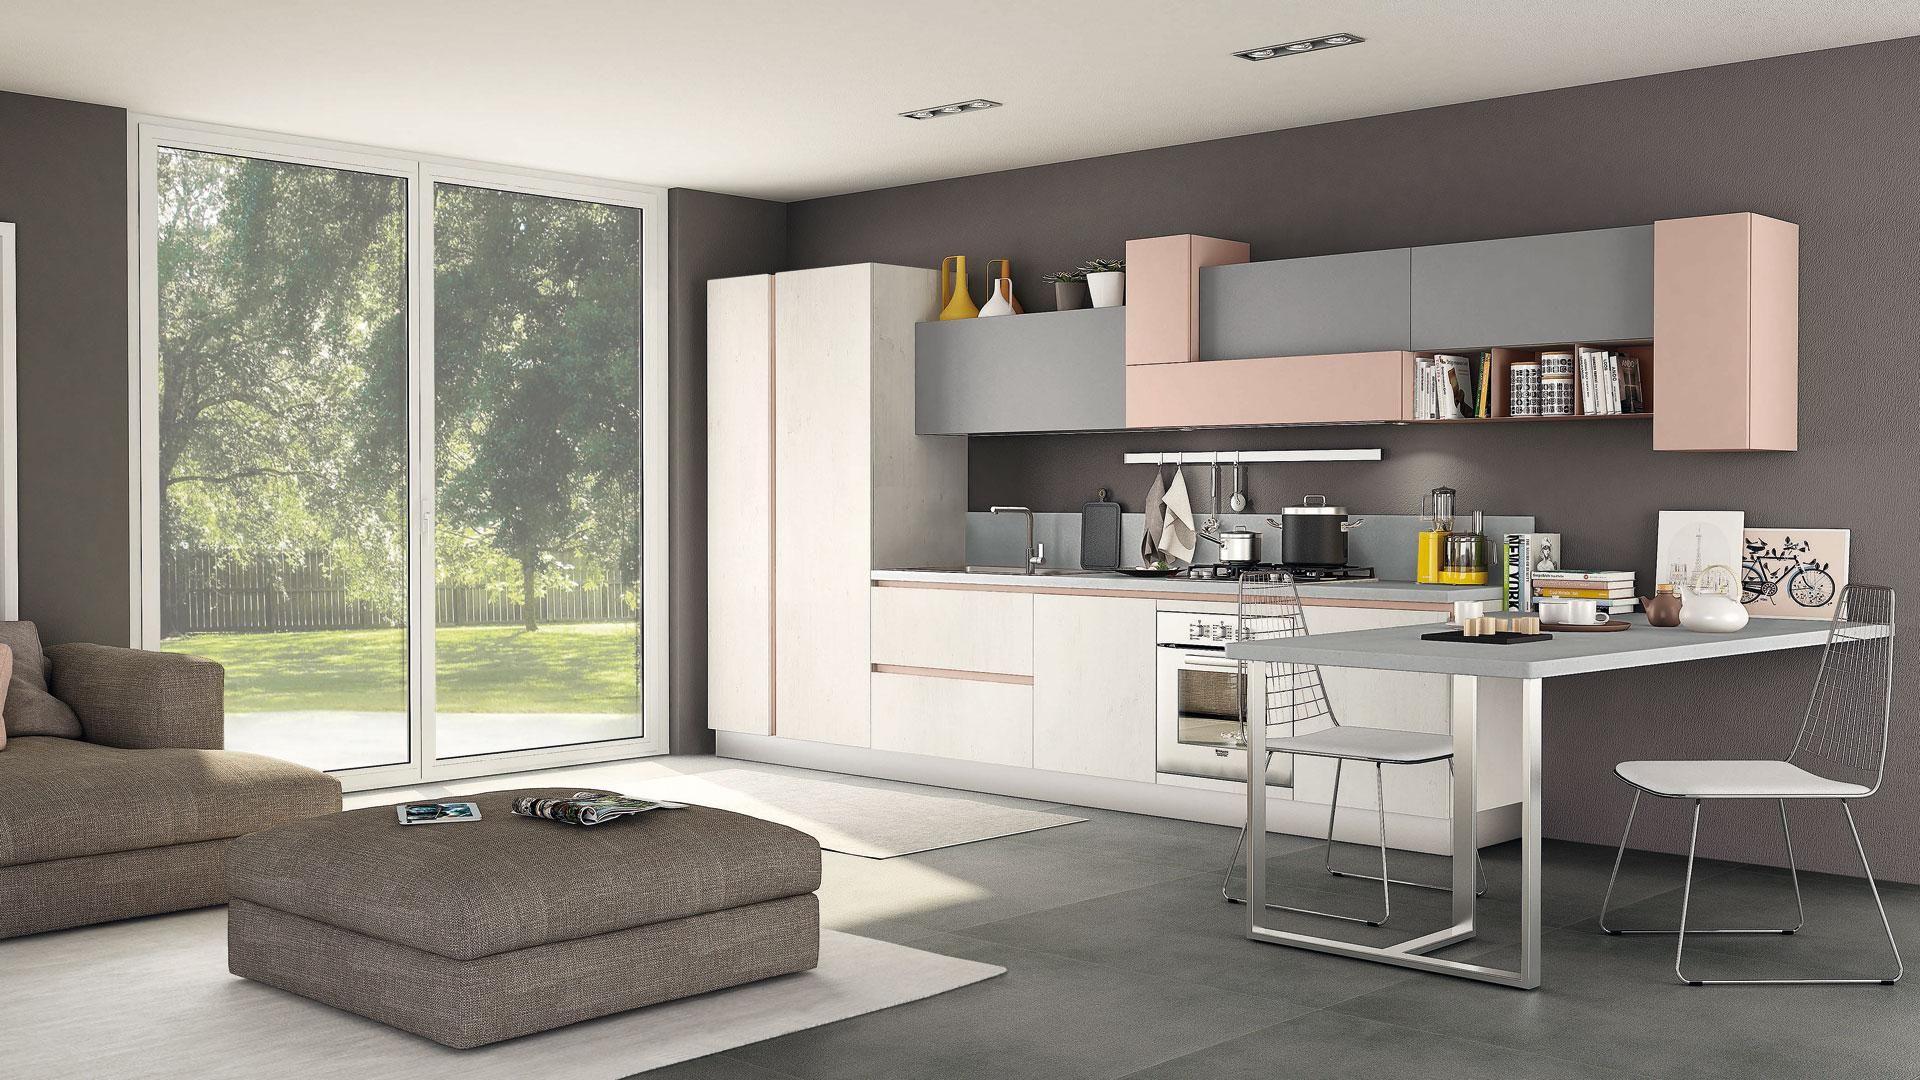 Immagina - Cucine Lube | Kitchen nel 2019 | Cucine moderne ...